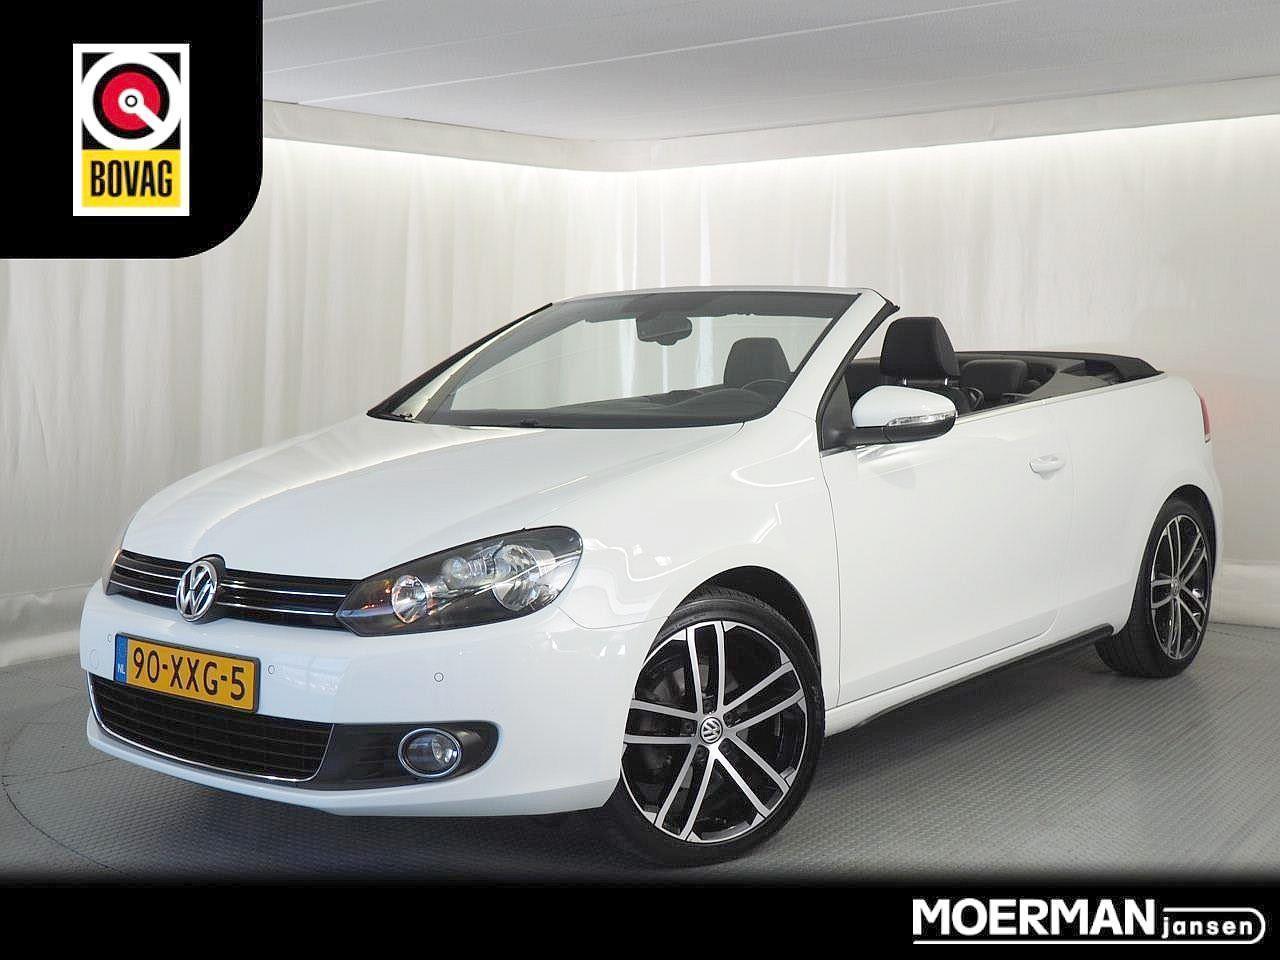 Volkswagen Golf Cabriolet 1.2 tsi bluemotion / alcantara / navigatie / volledig onderhouden